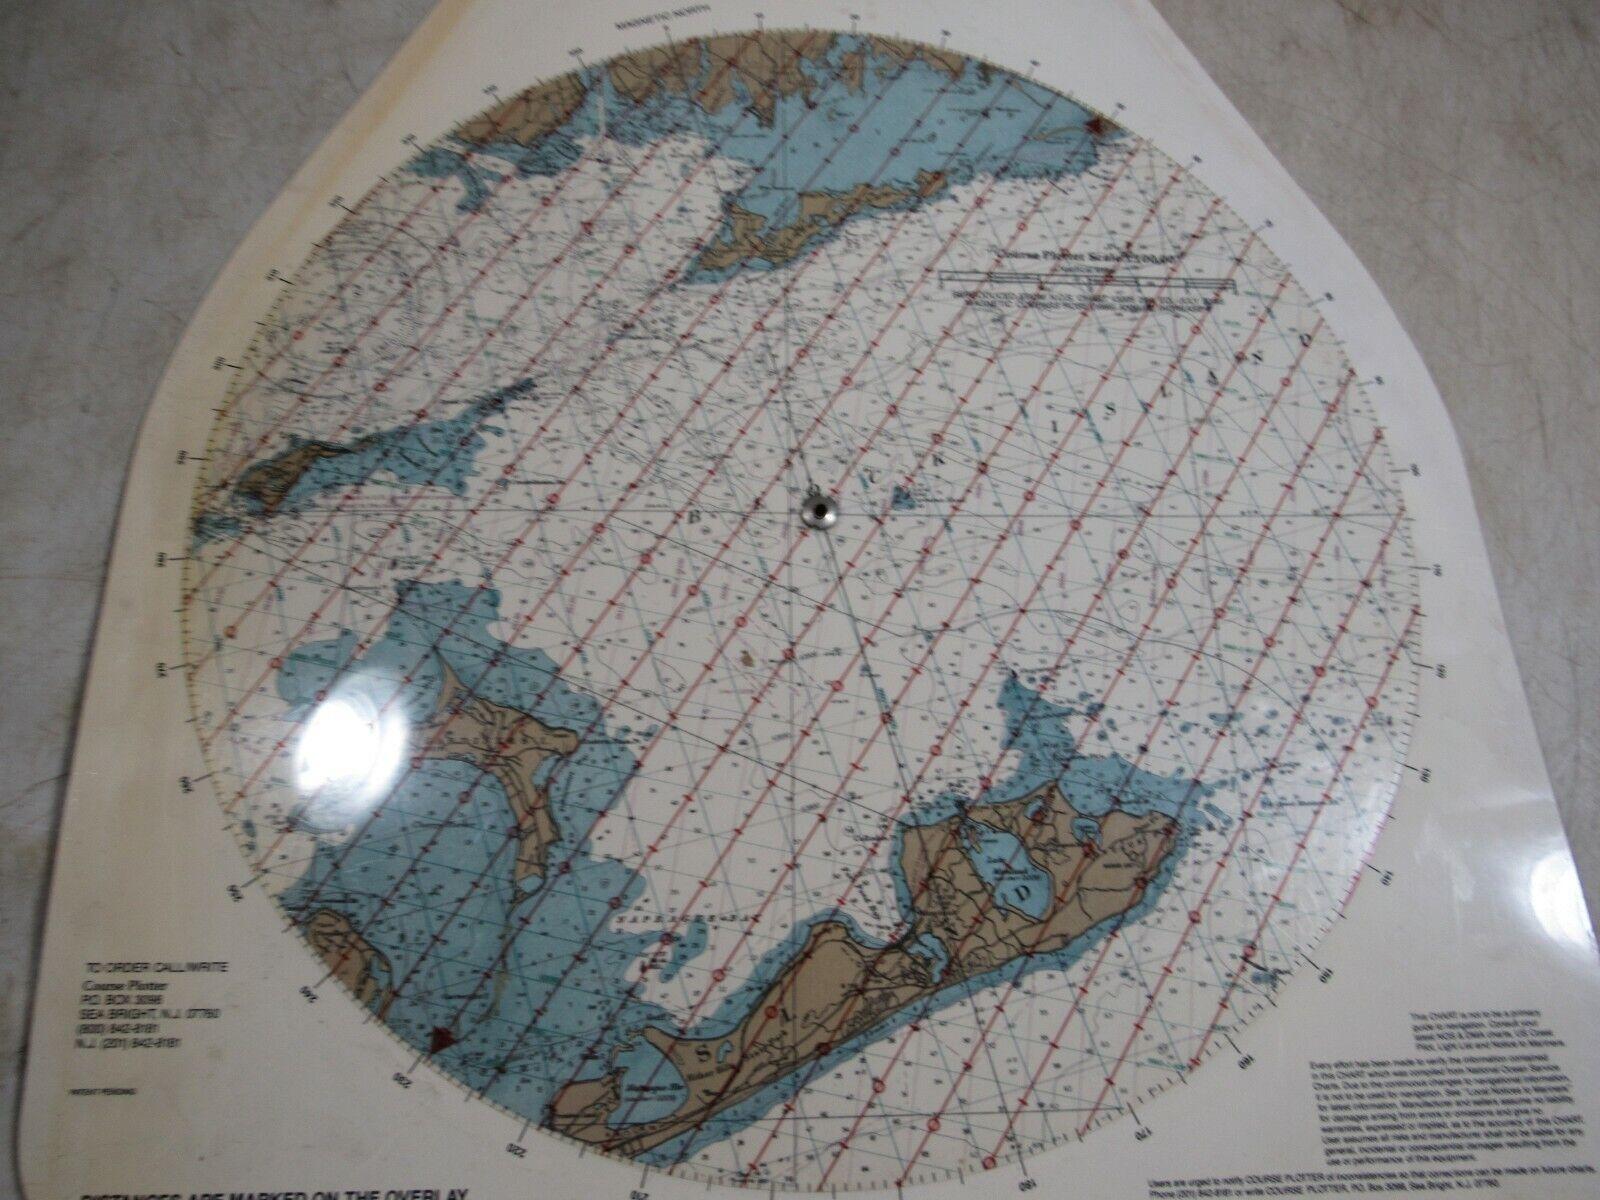 Vintage Waterproof Loran-C Overprinted Course Plotter Chart Block Island Sound